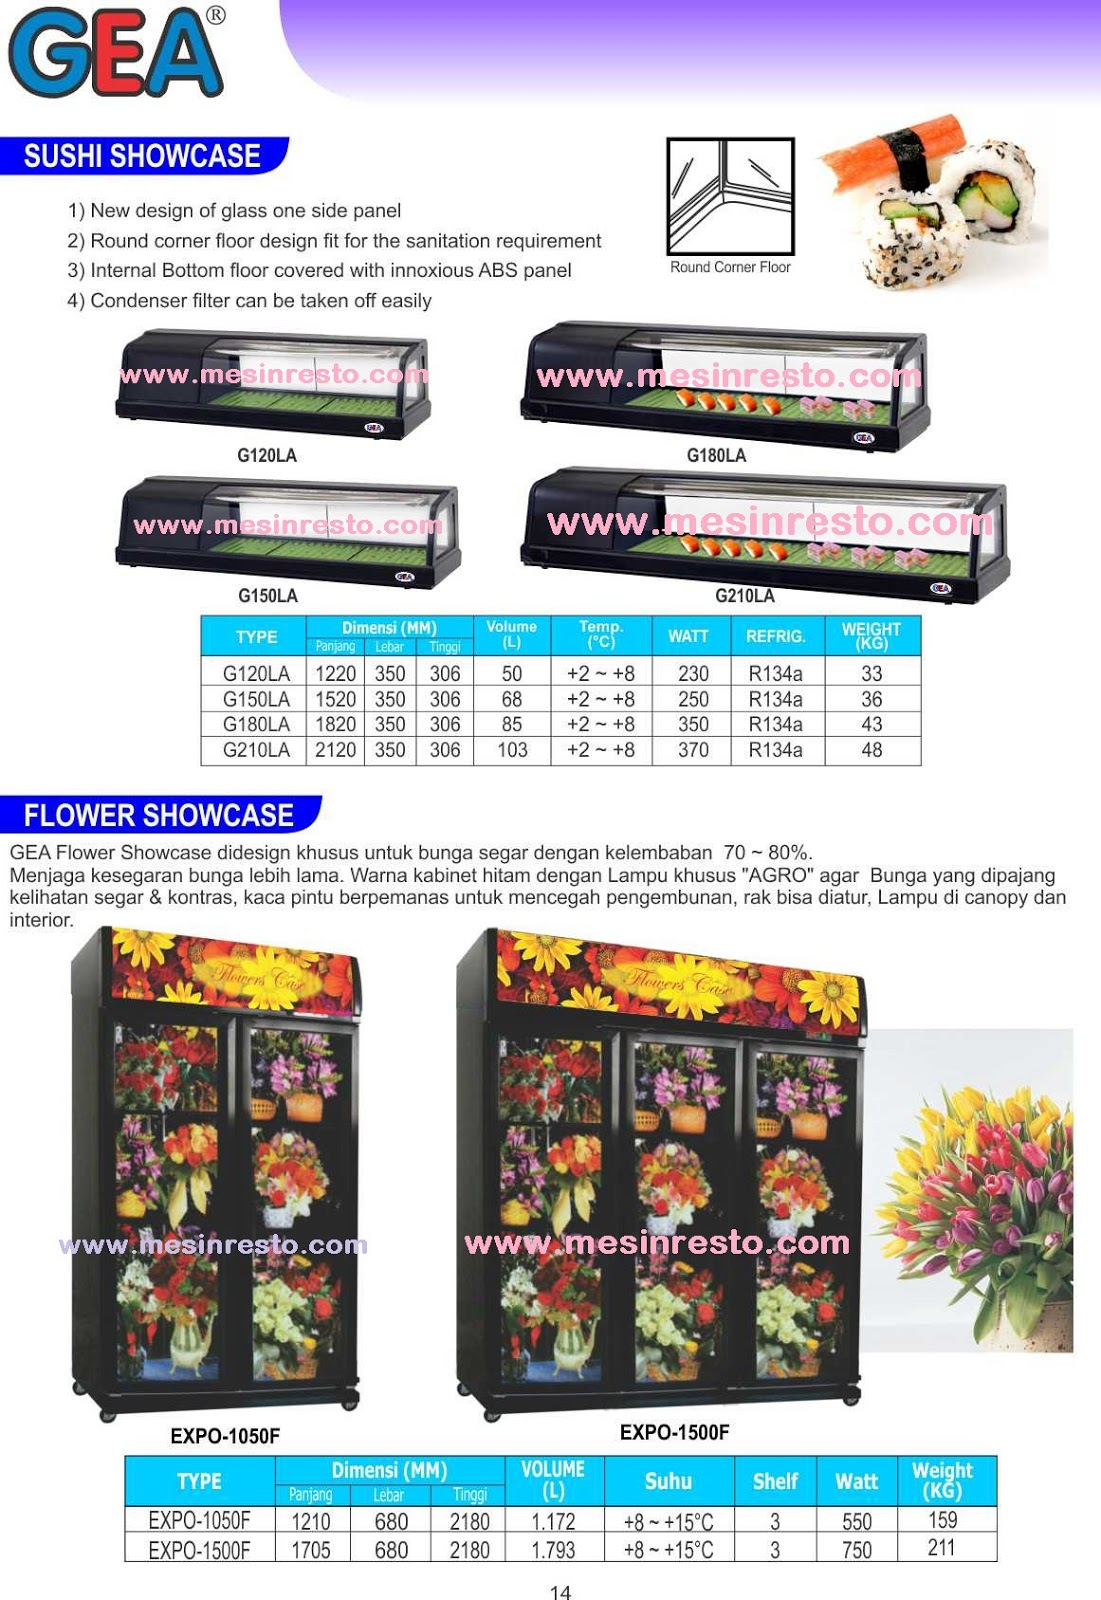 Jual Showcase Display Cooler Chiller dan Freezer ; Agen Distributor